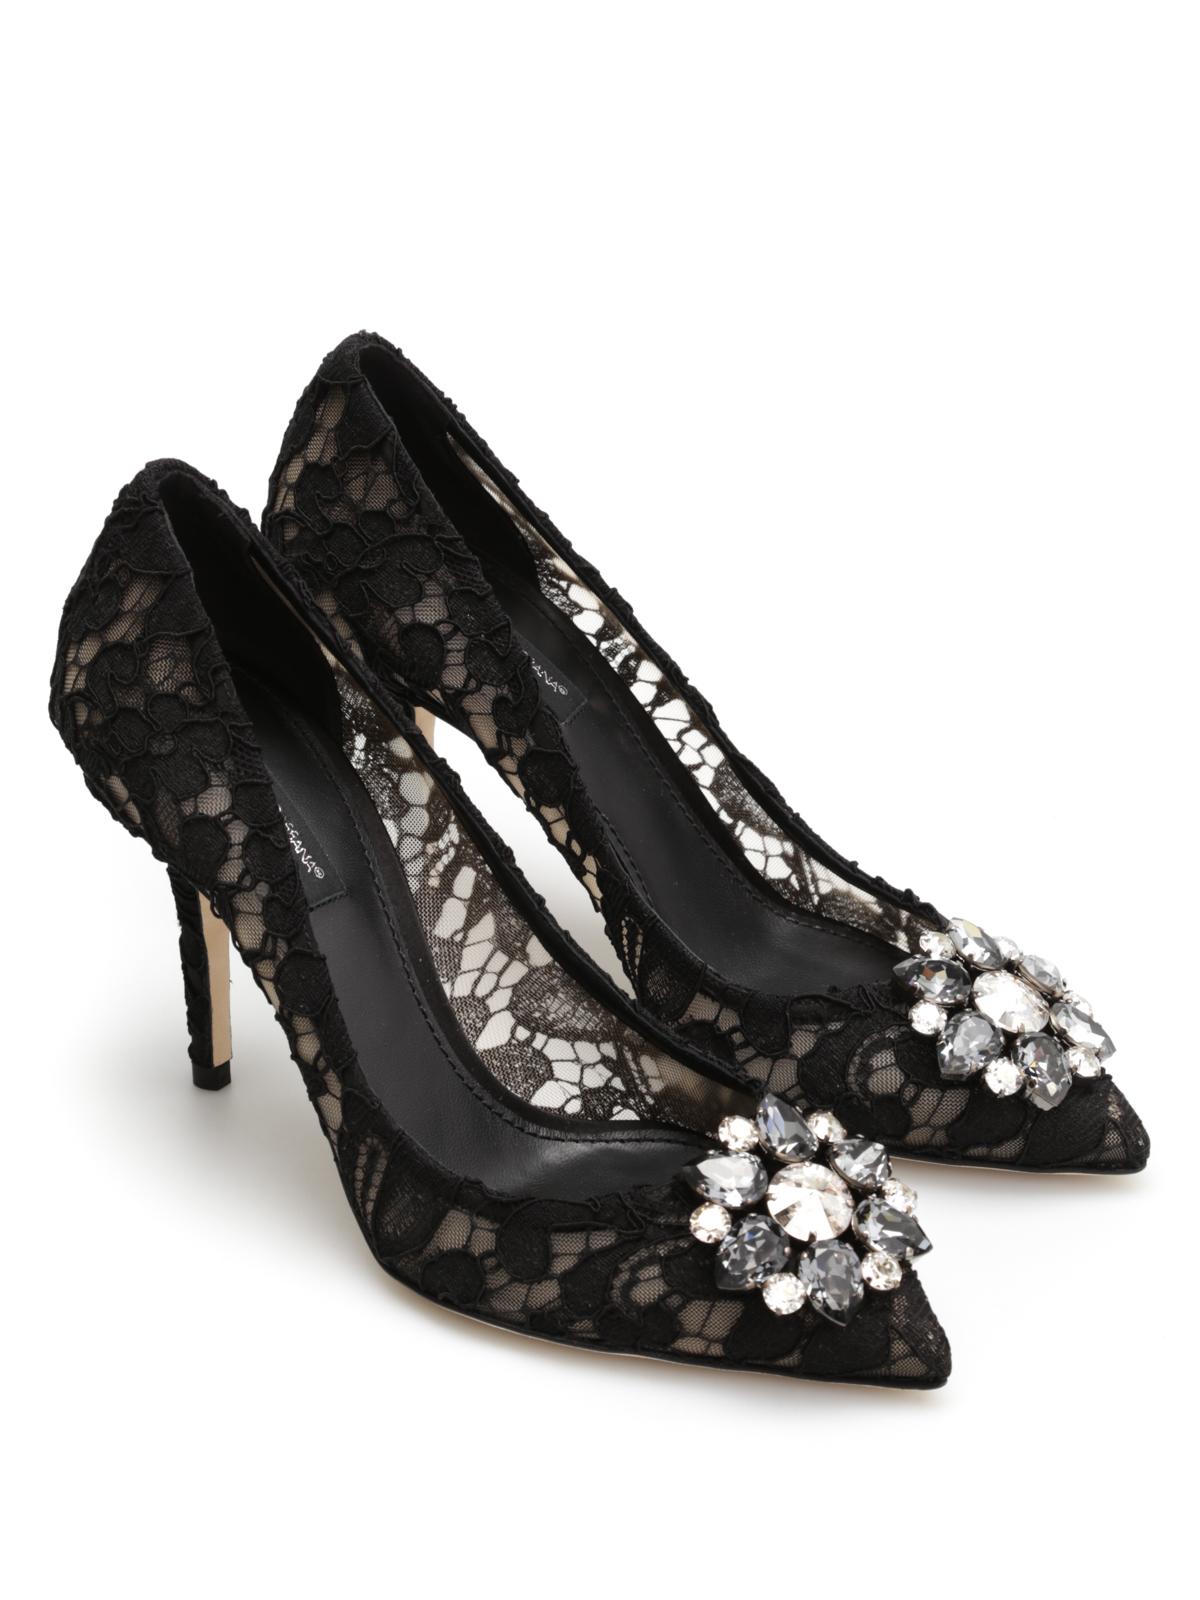 dolce gabbana shoes online